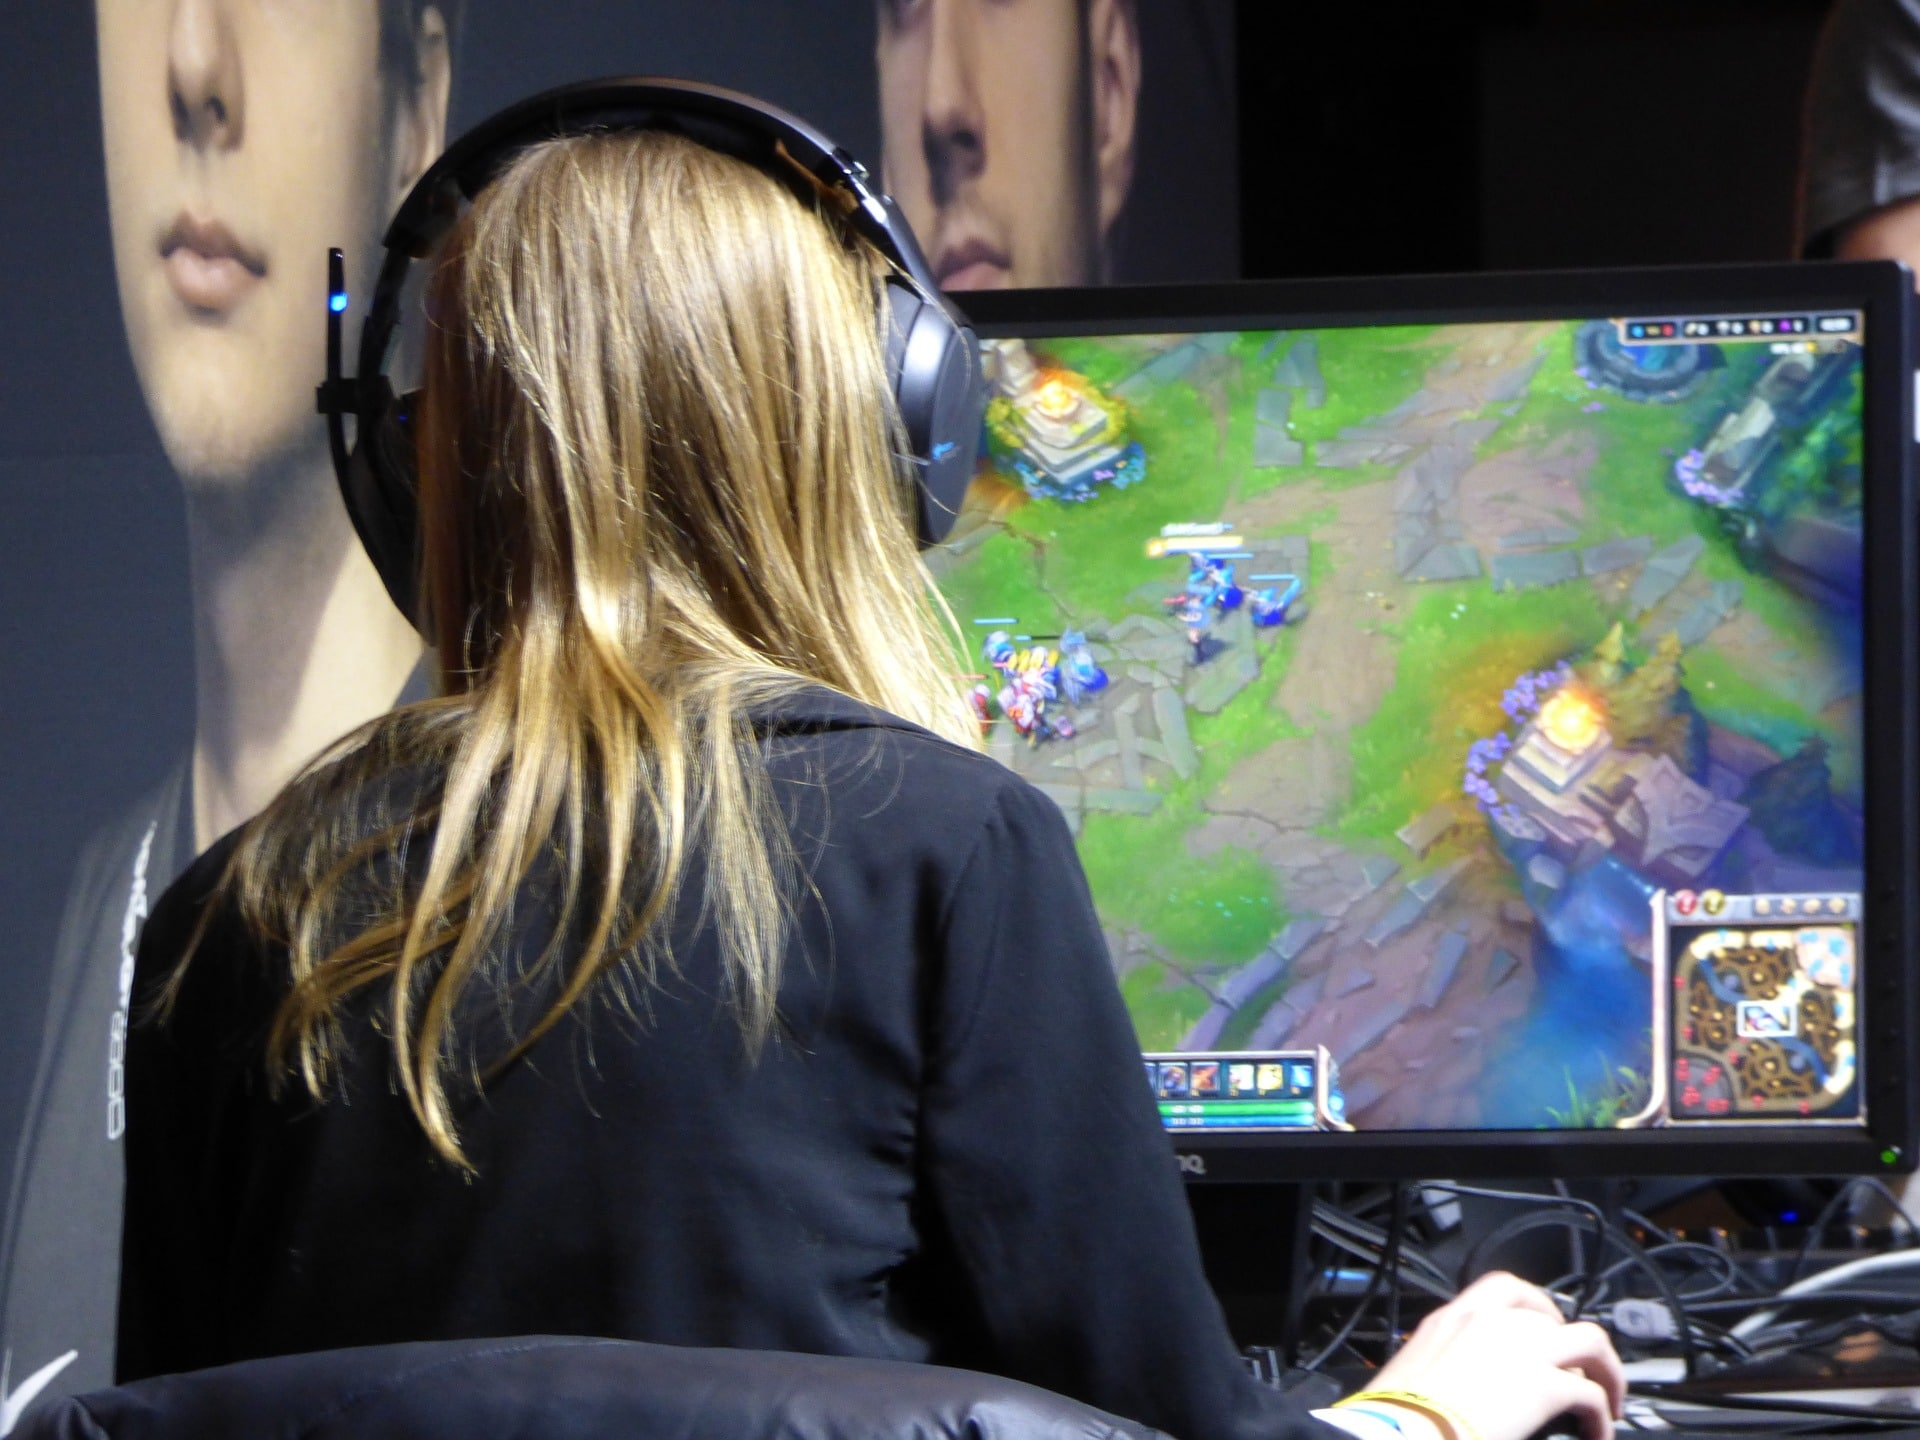 cuffie-per-giocare-online